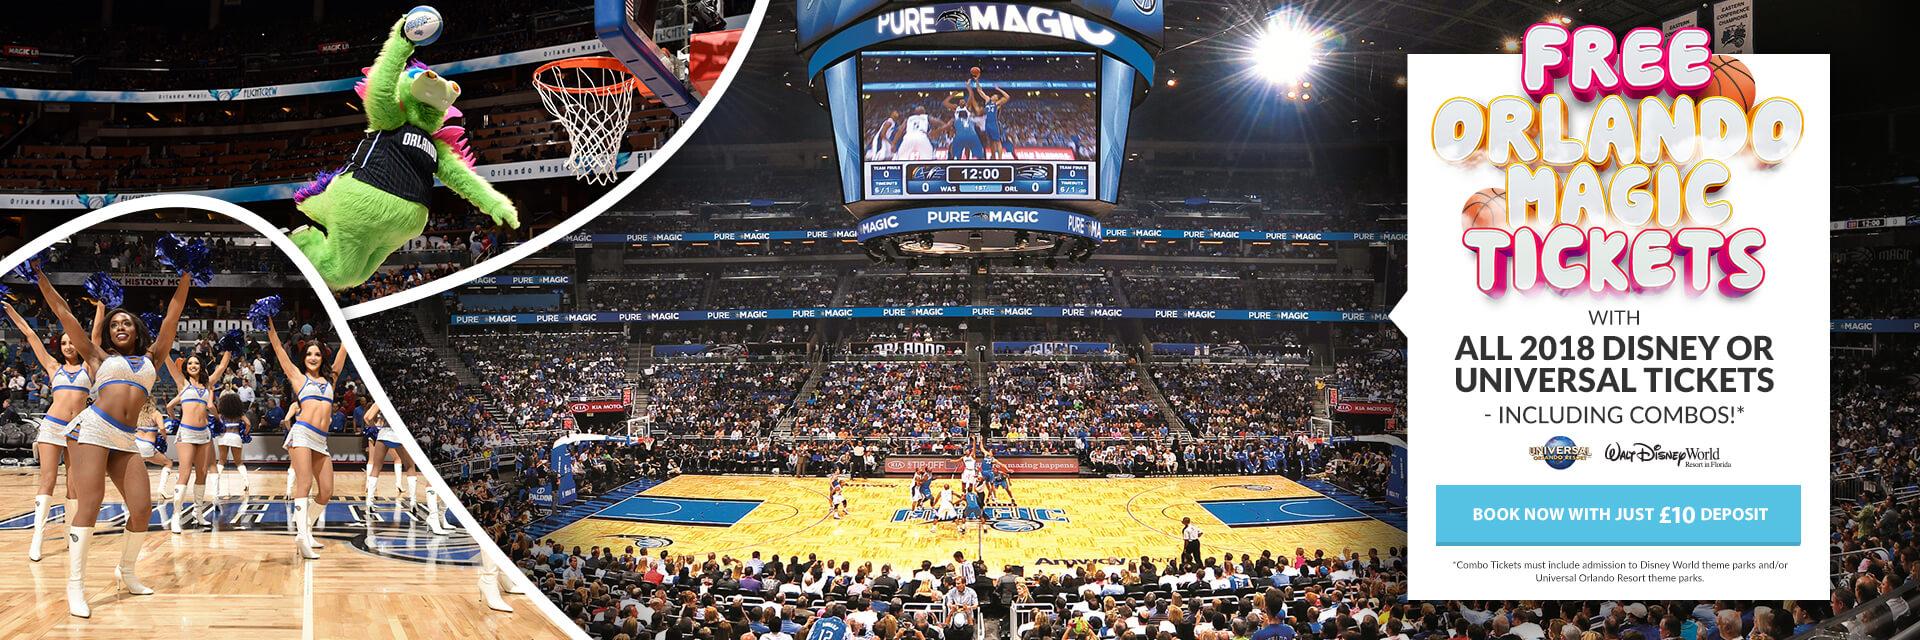 Free Orlando Magic Tickets